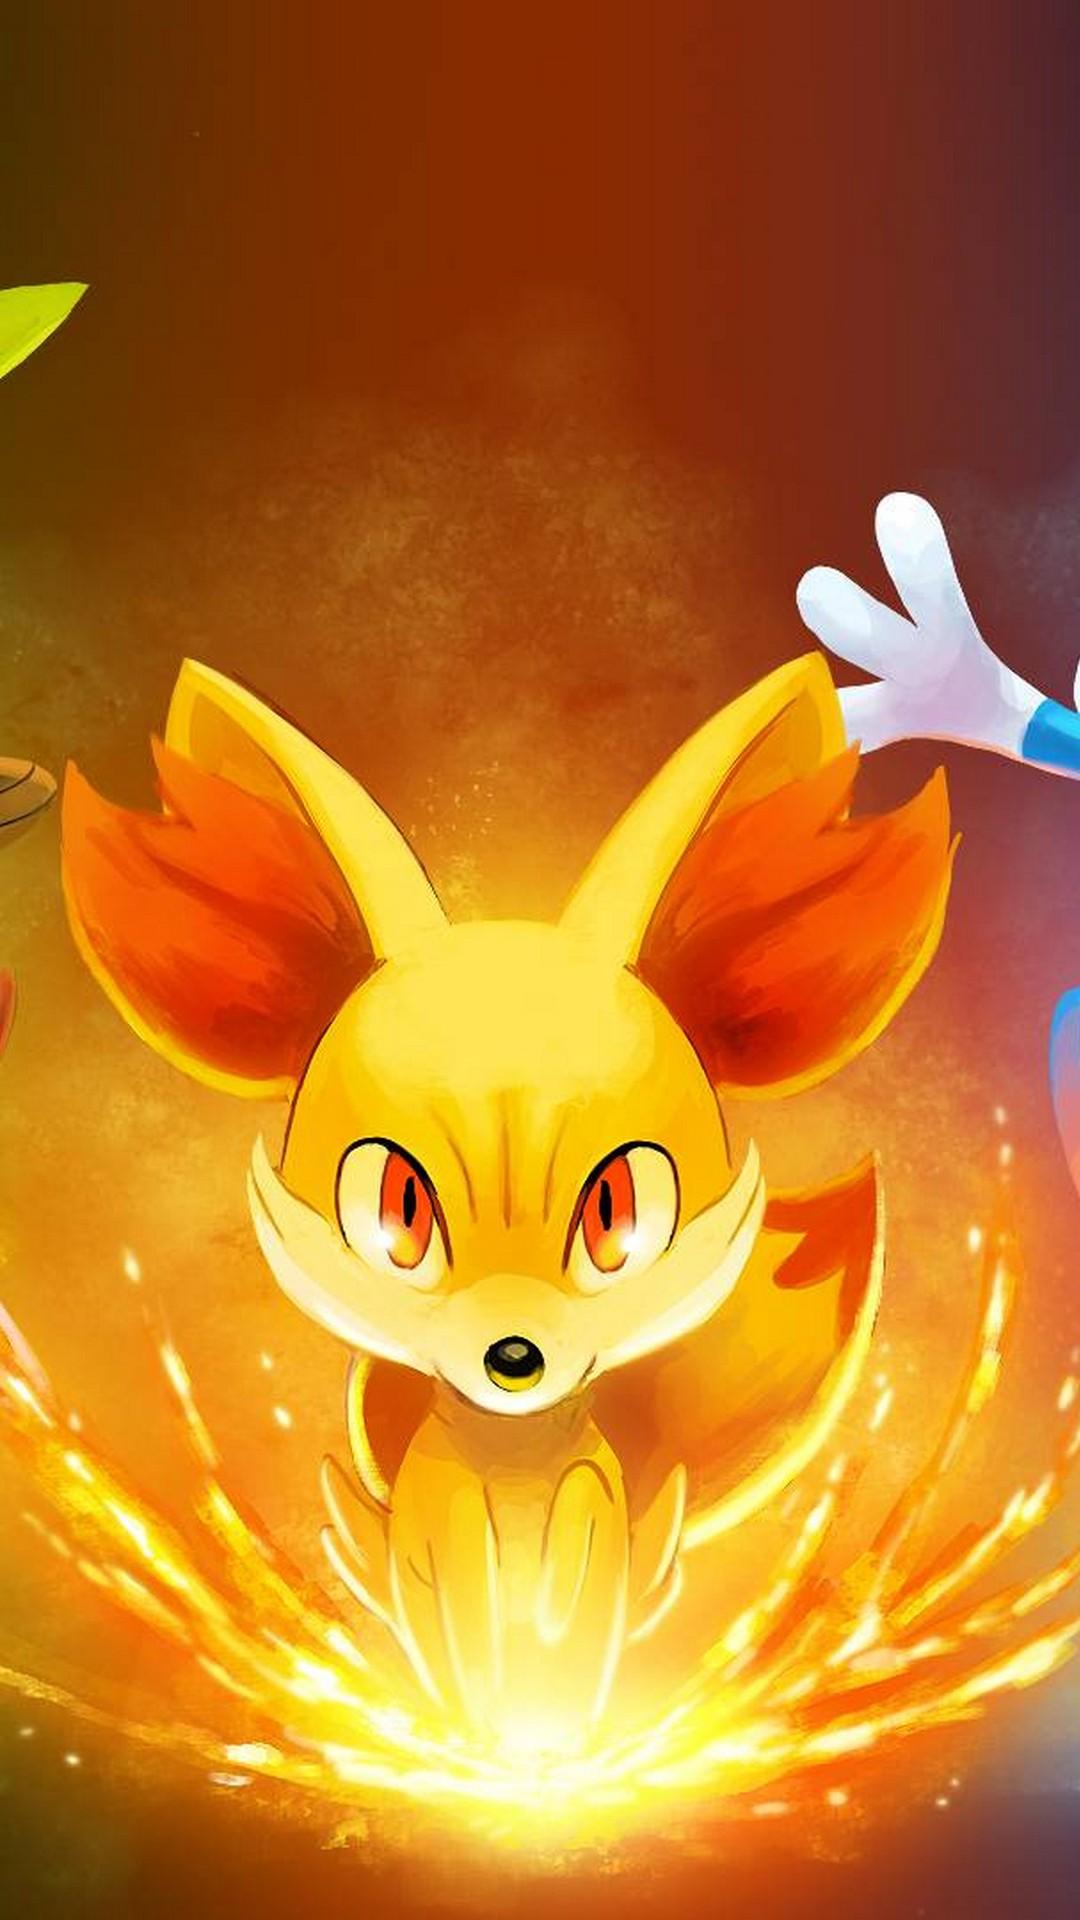 Pokemon Wallpaper For iPhone 2019 3D iPhone Wallpaper 1080x1920